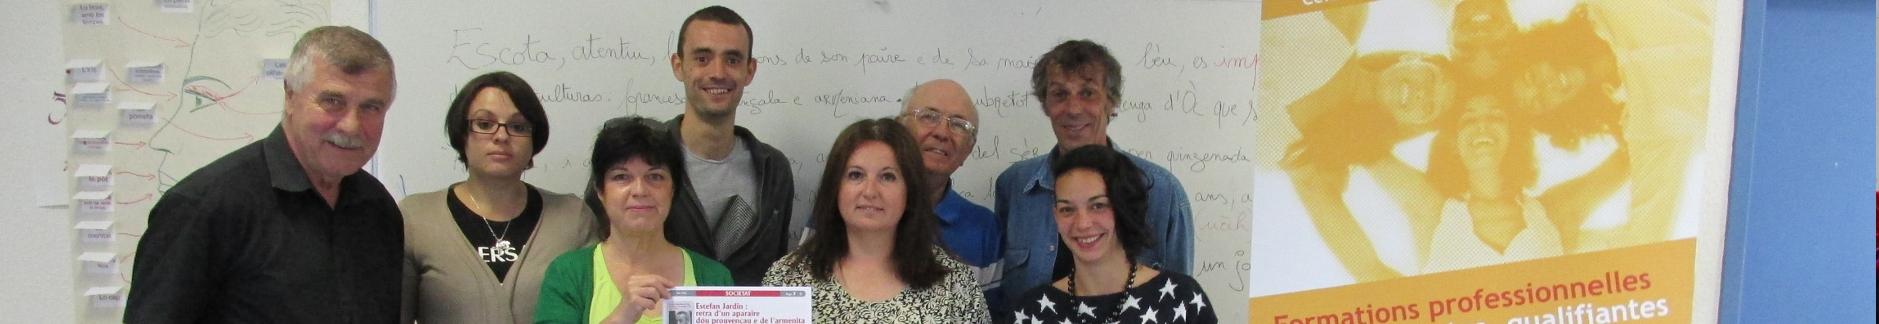 bandeau-ff2015